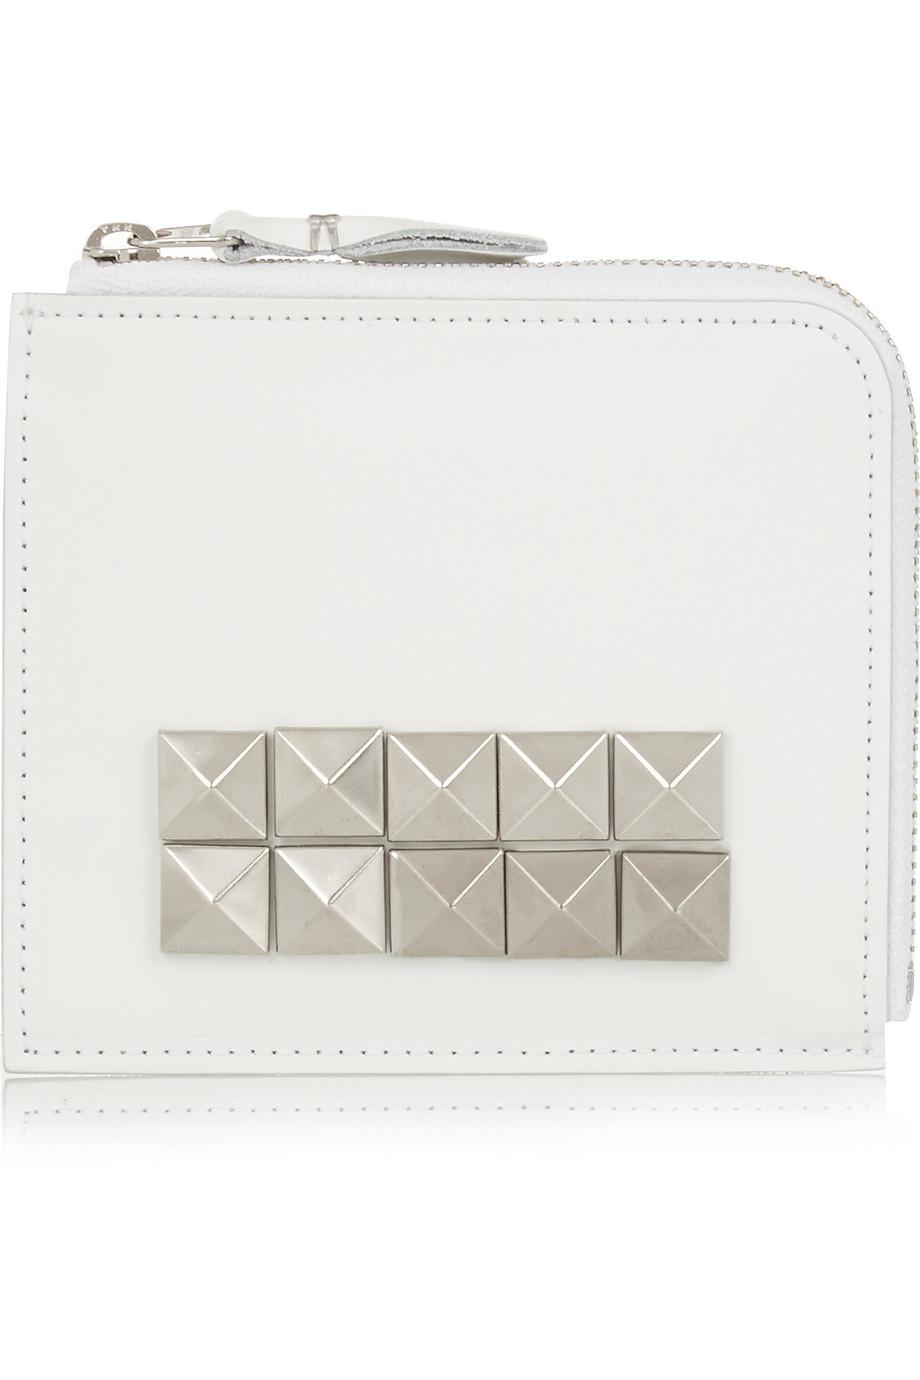 Studded Leather Wallet, Comme Des Garçons, White, Women's